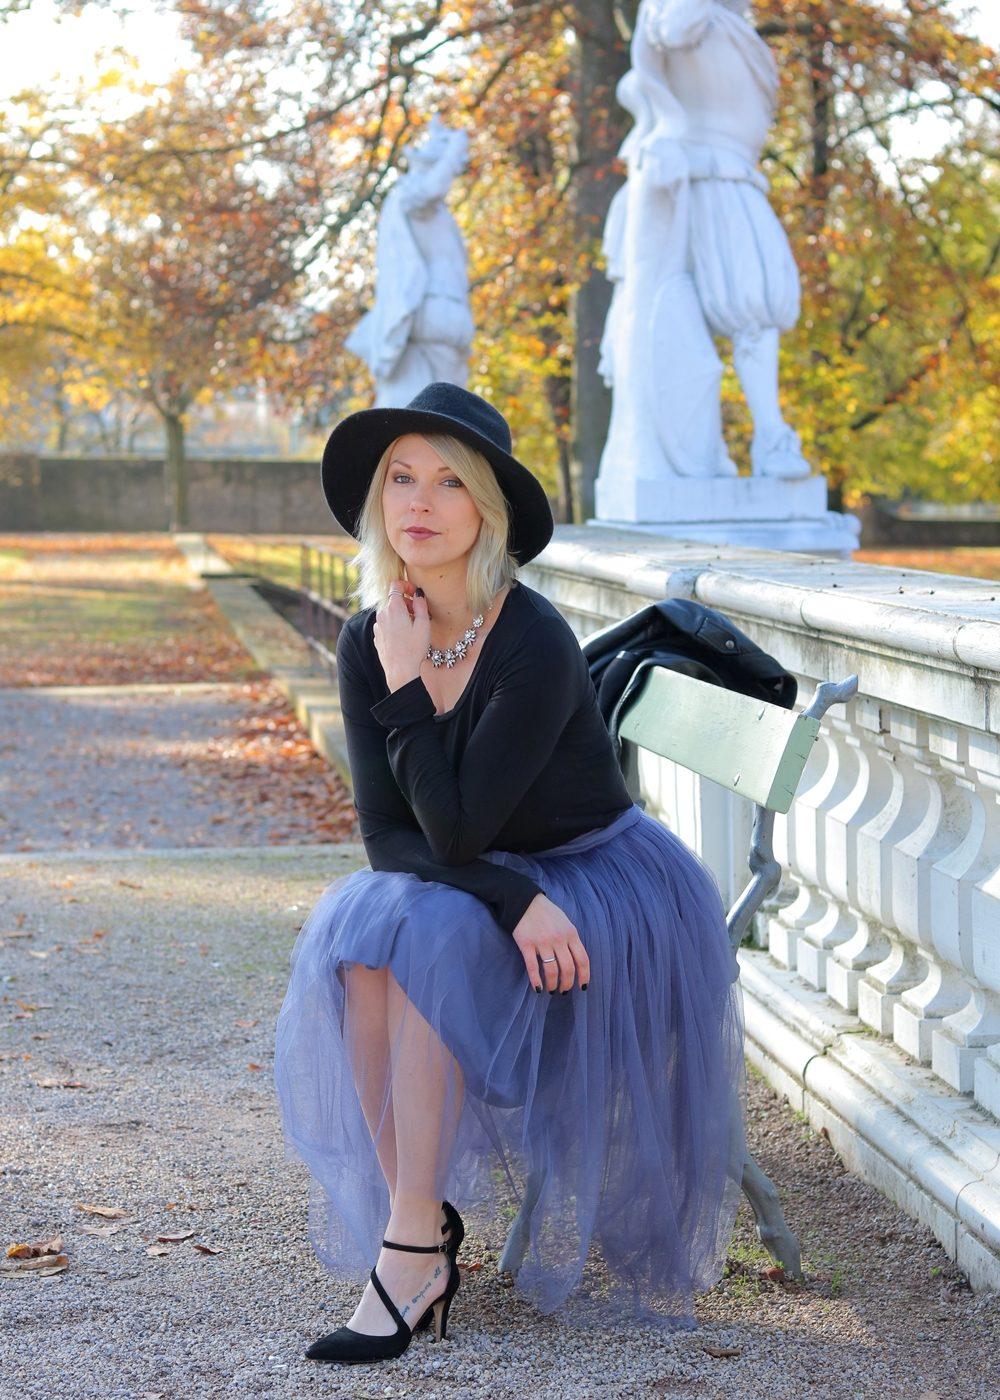 fashionblogger-karlsruhe-outfit-lila-tuellrock-asos-shirt-pumps-tamaris-schwarzer-hut-29